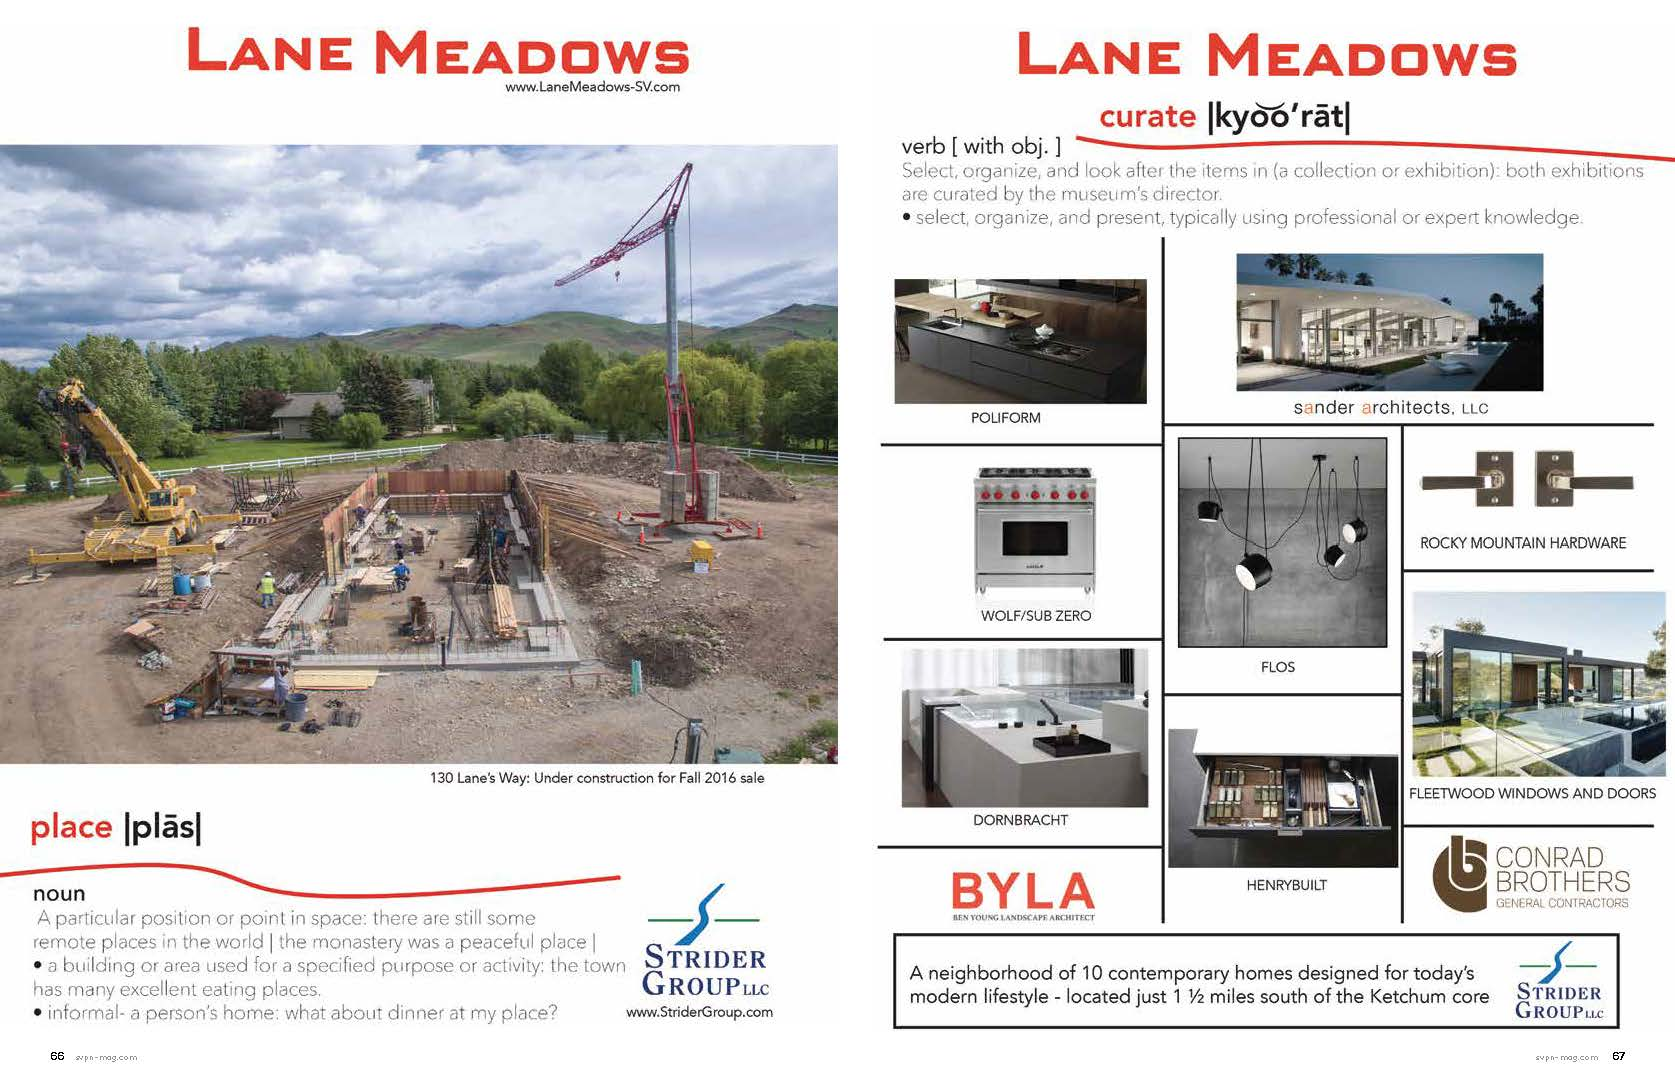 Lane Meadows Gallery (2)_Page_1.jpg